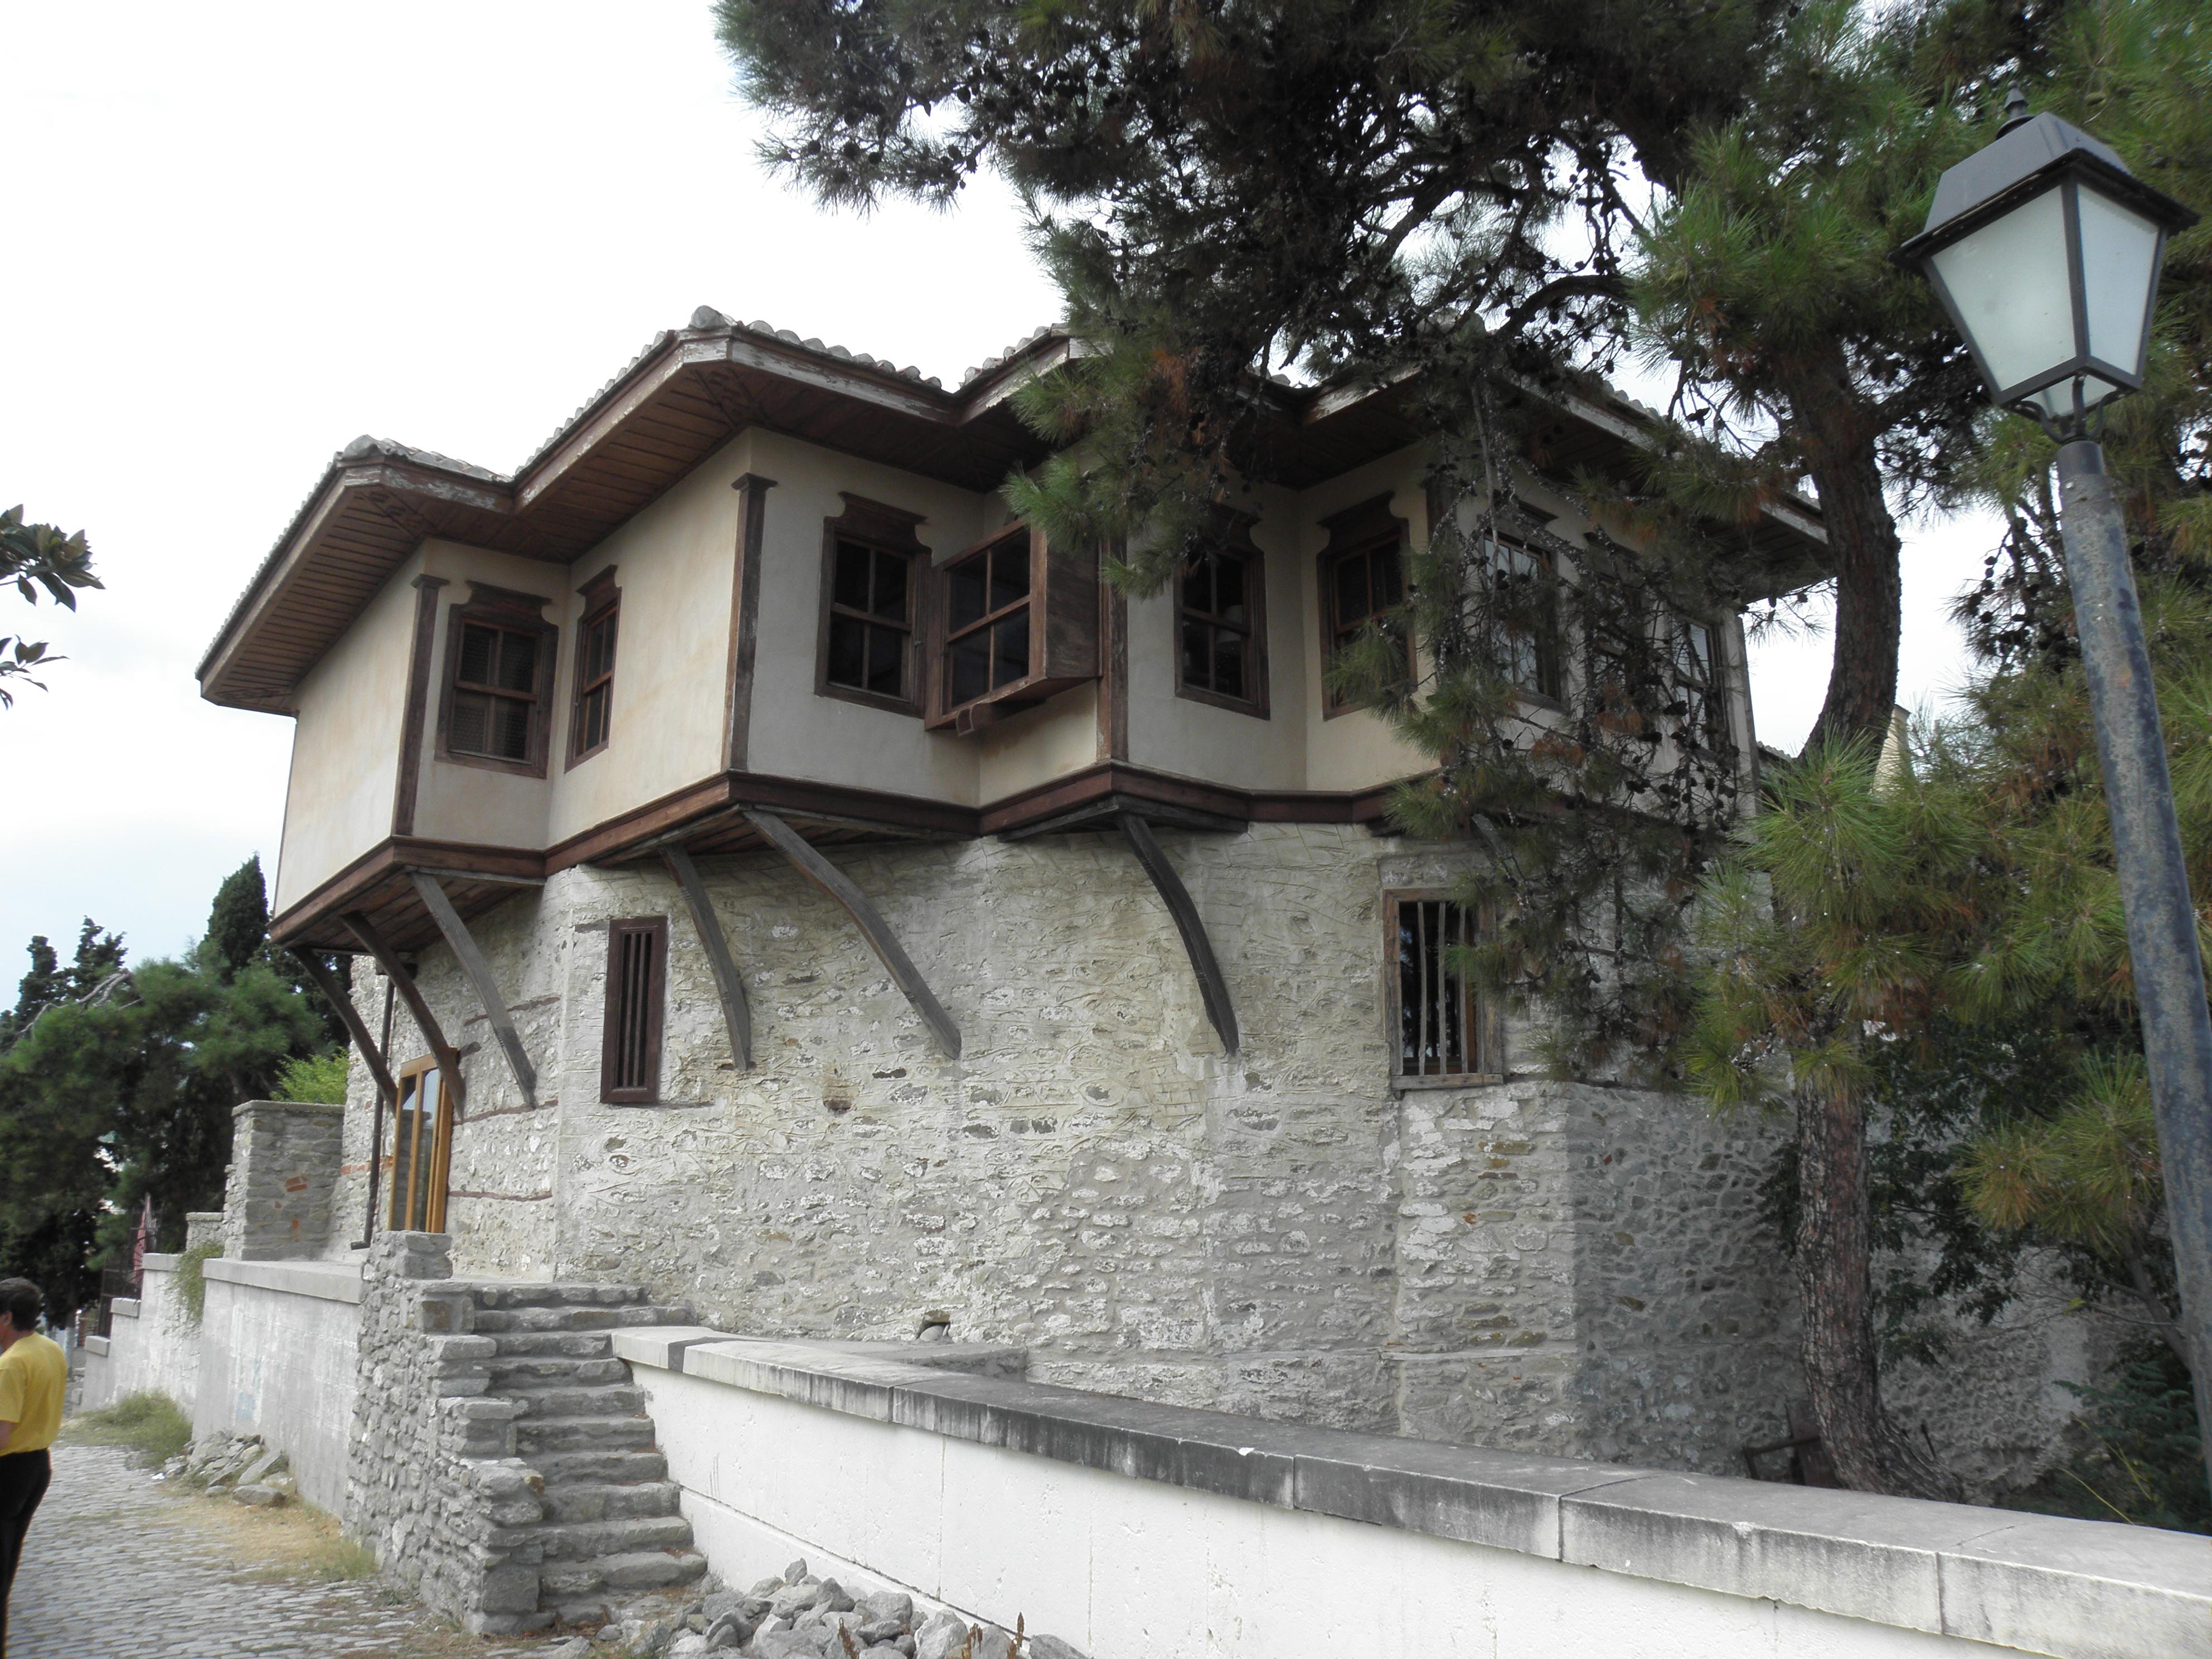 Ali pashas house in kavala, greece photo